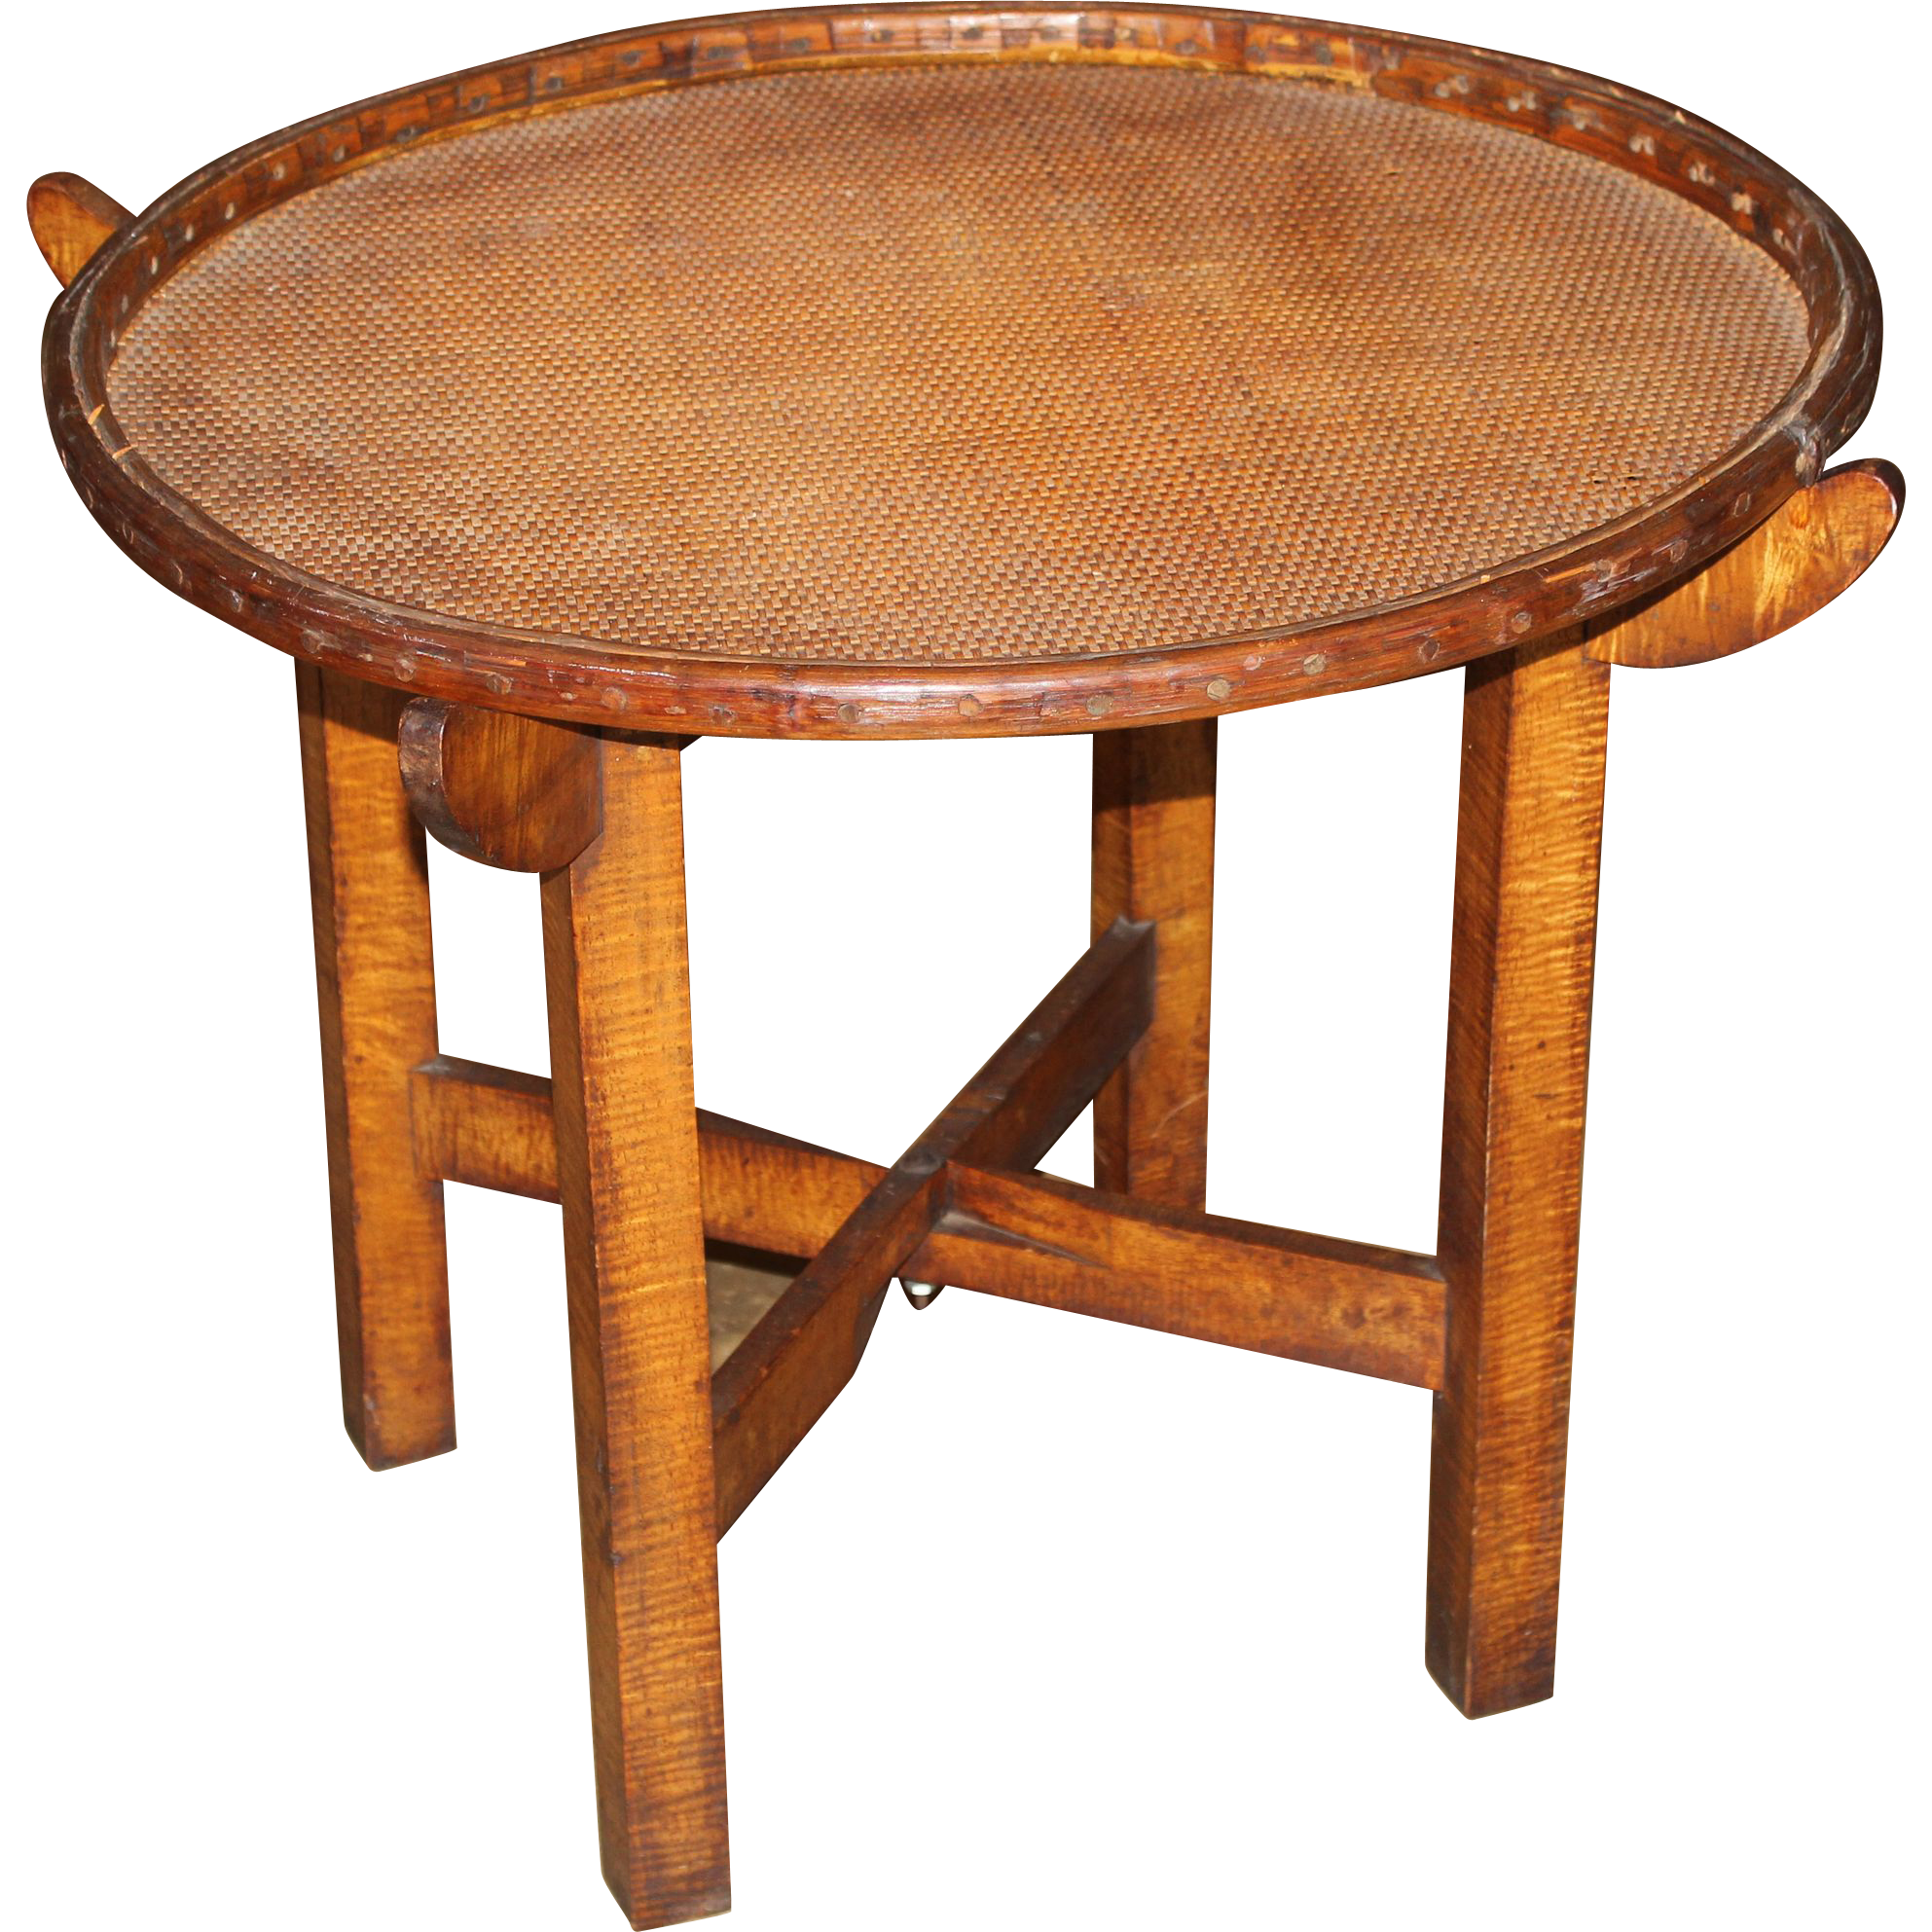 Vintage Mid Century Coffee Table Hawaiian Koa Wood By: 19th / 20th C Hawaiian Wooden Round Occasional Table From